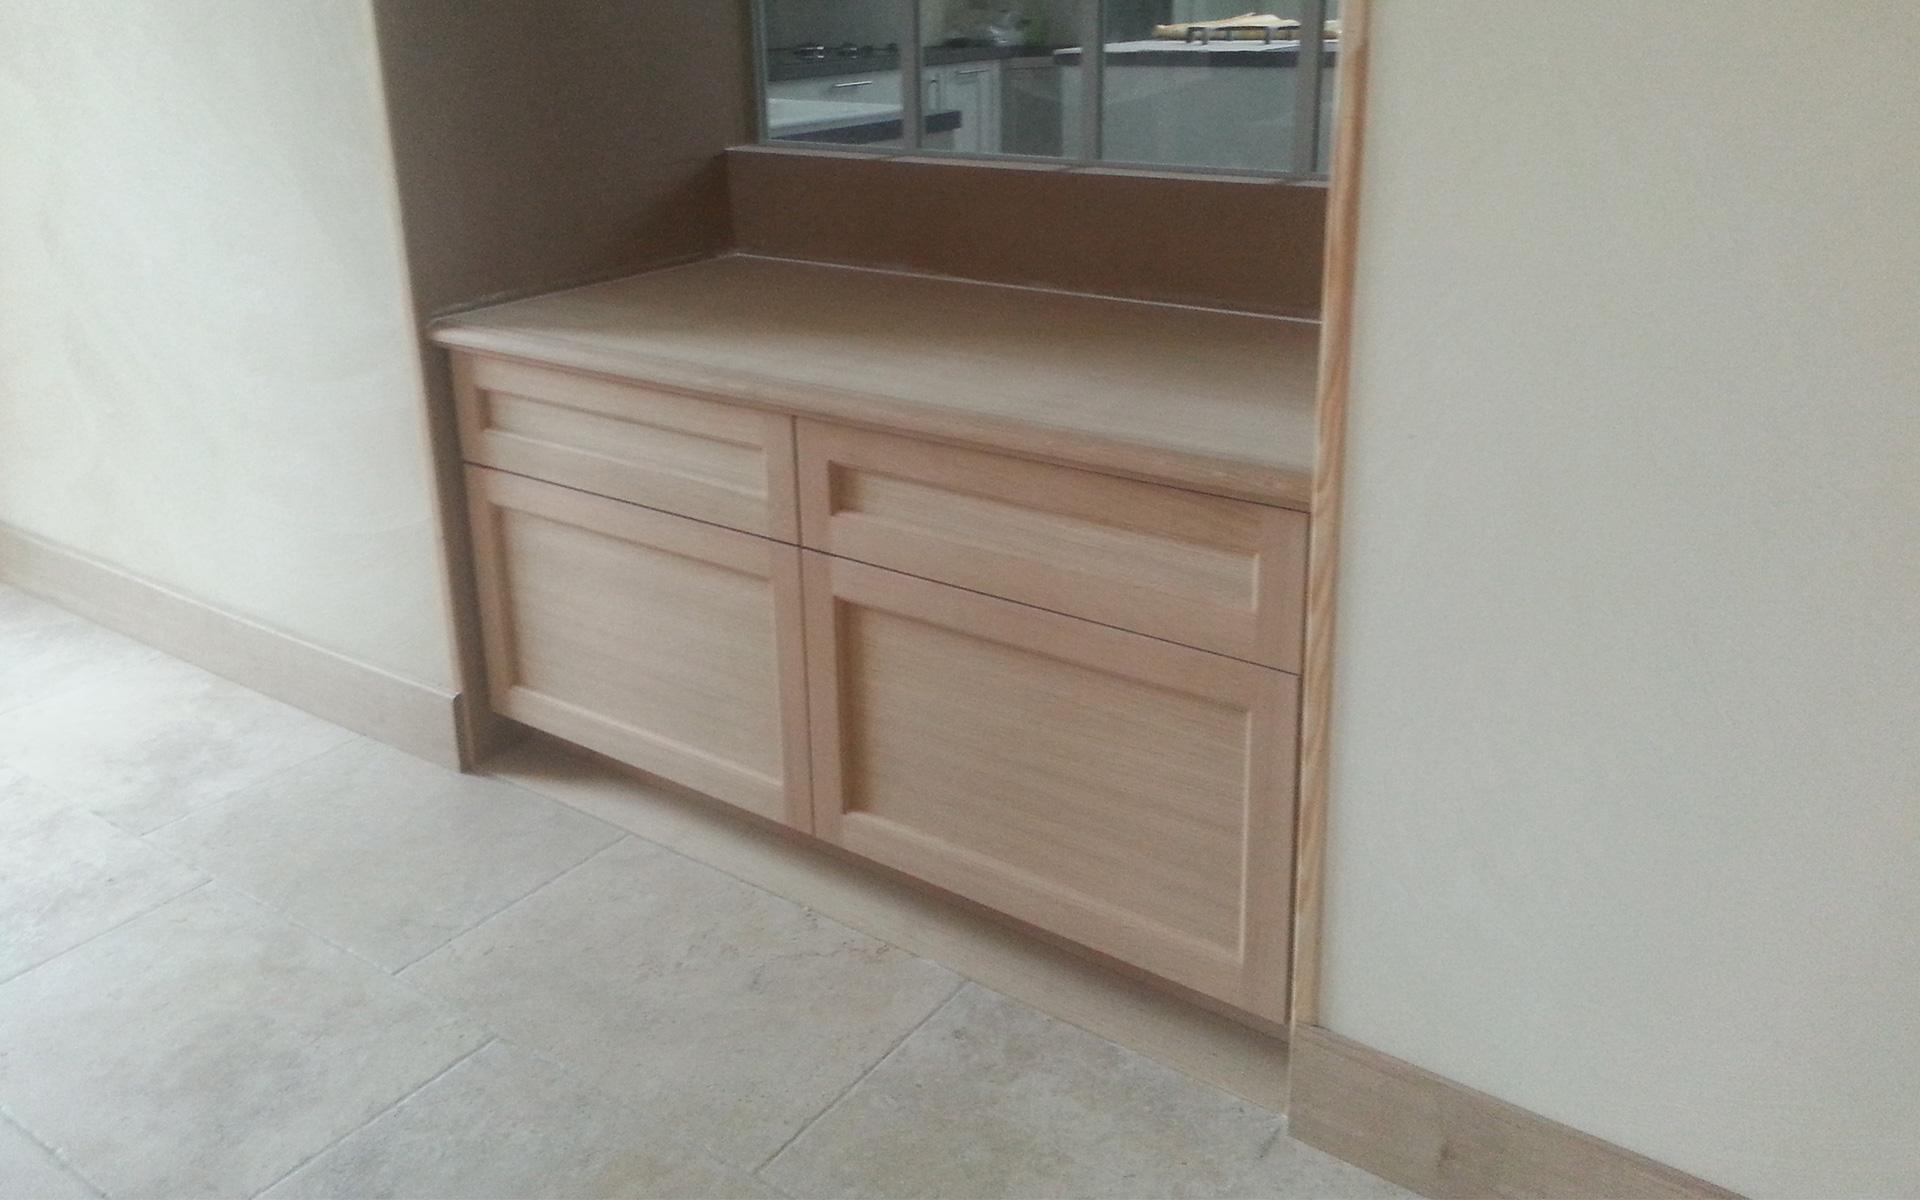 mobilier-bois-fabrication-pose-menuiserie-josselin-pleslin-trigavou-dinan-dinard-saint-malo